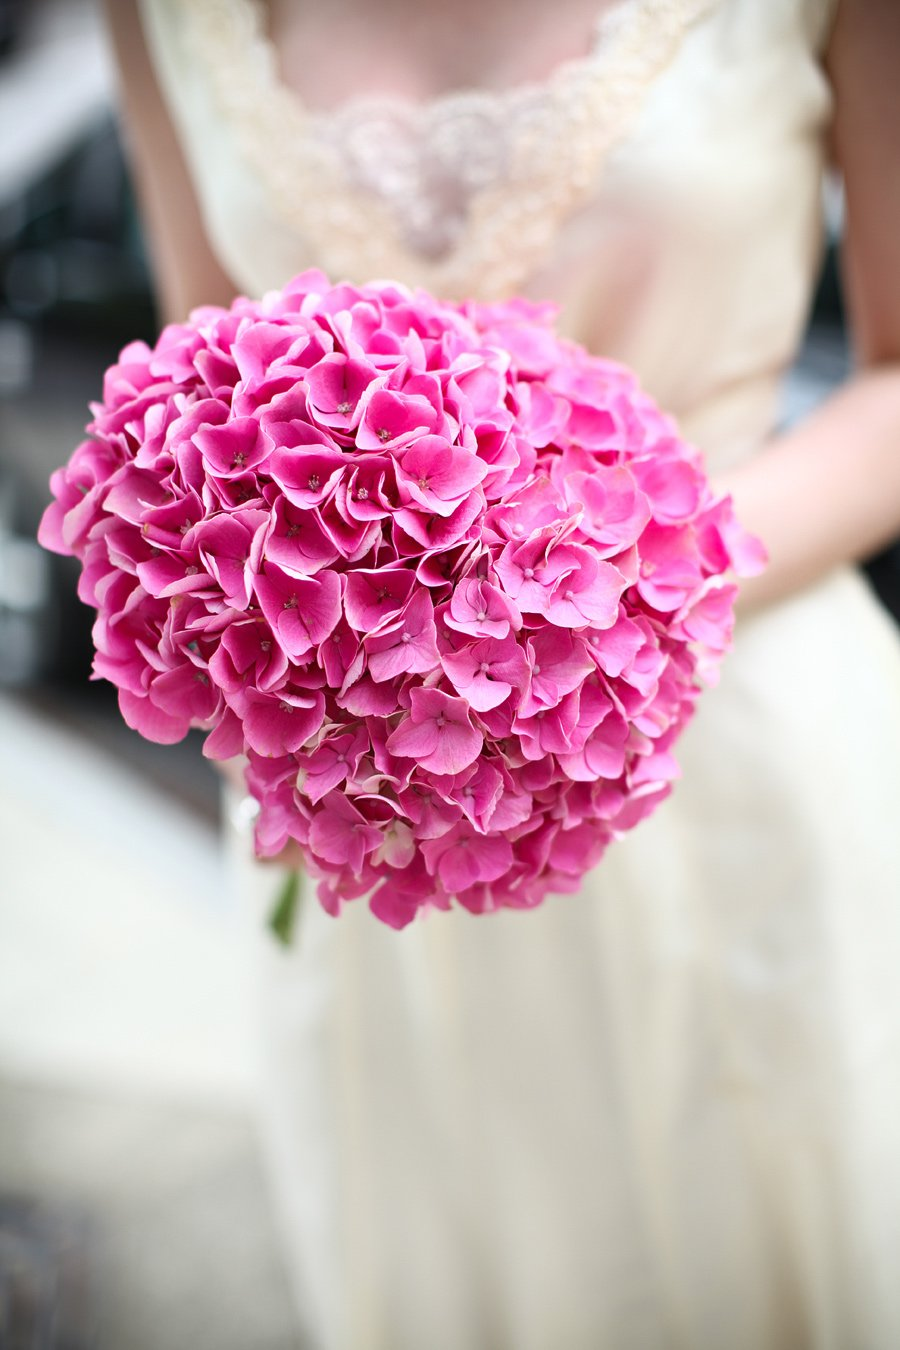 Berkshire-Wedding-Photography-Fazackarley-Aisling-and-Philip-11